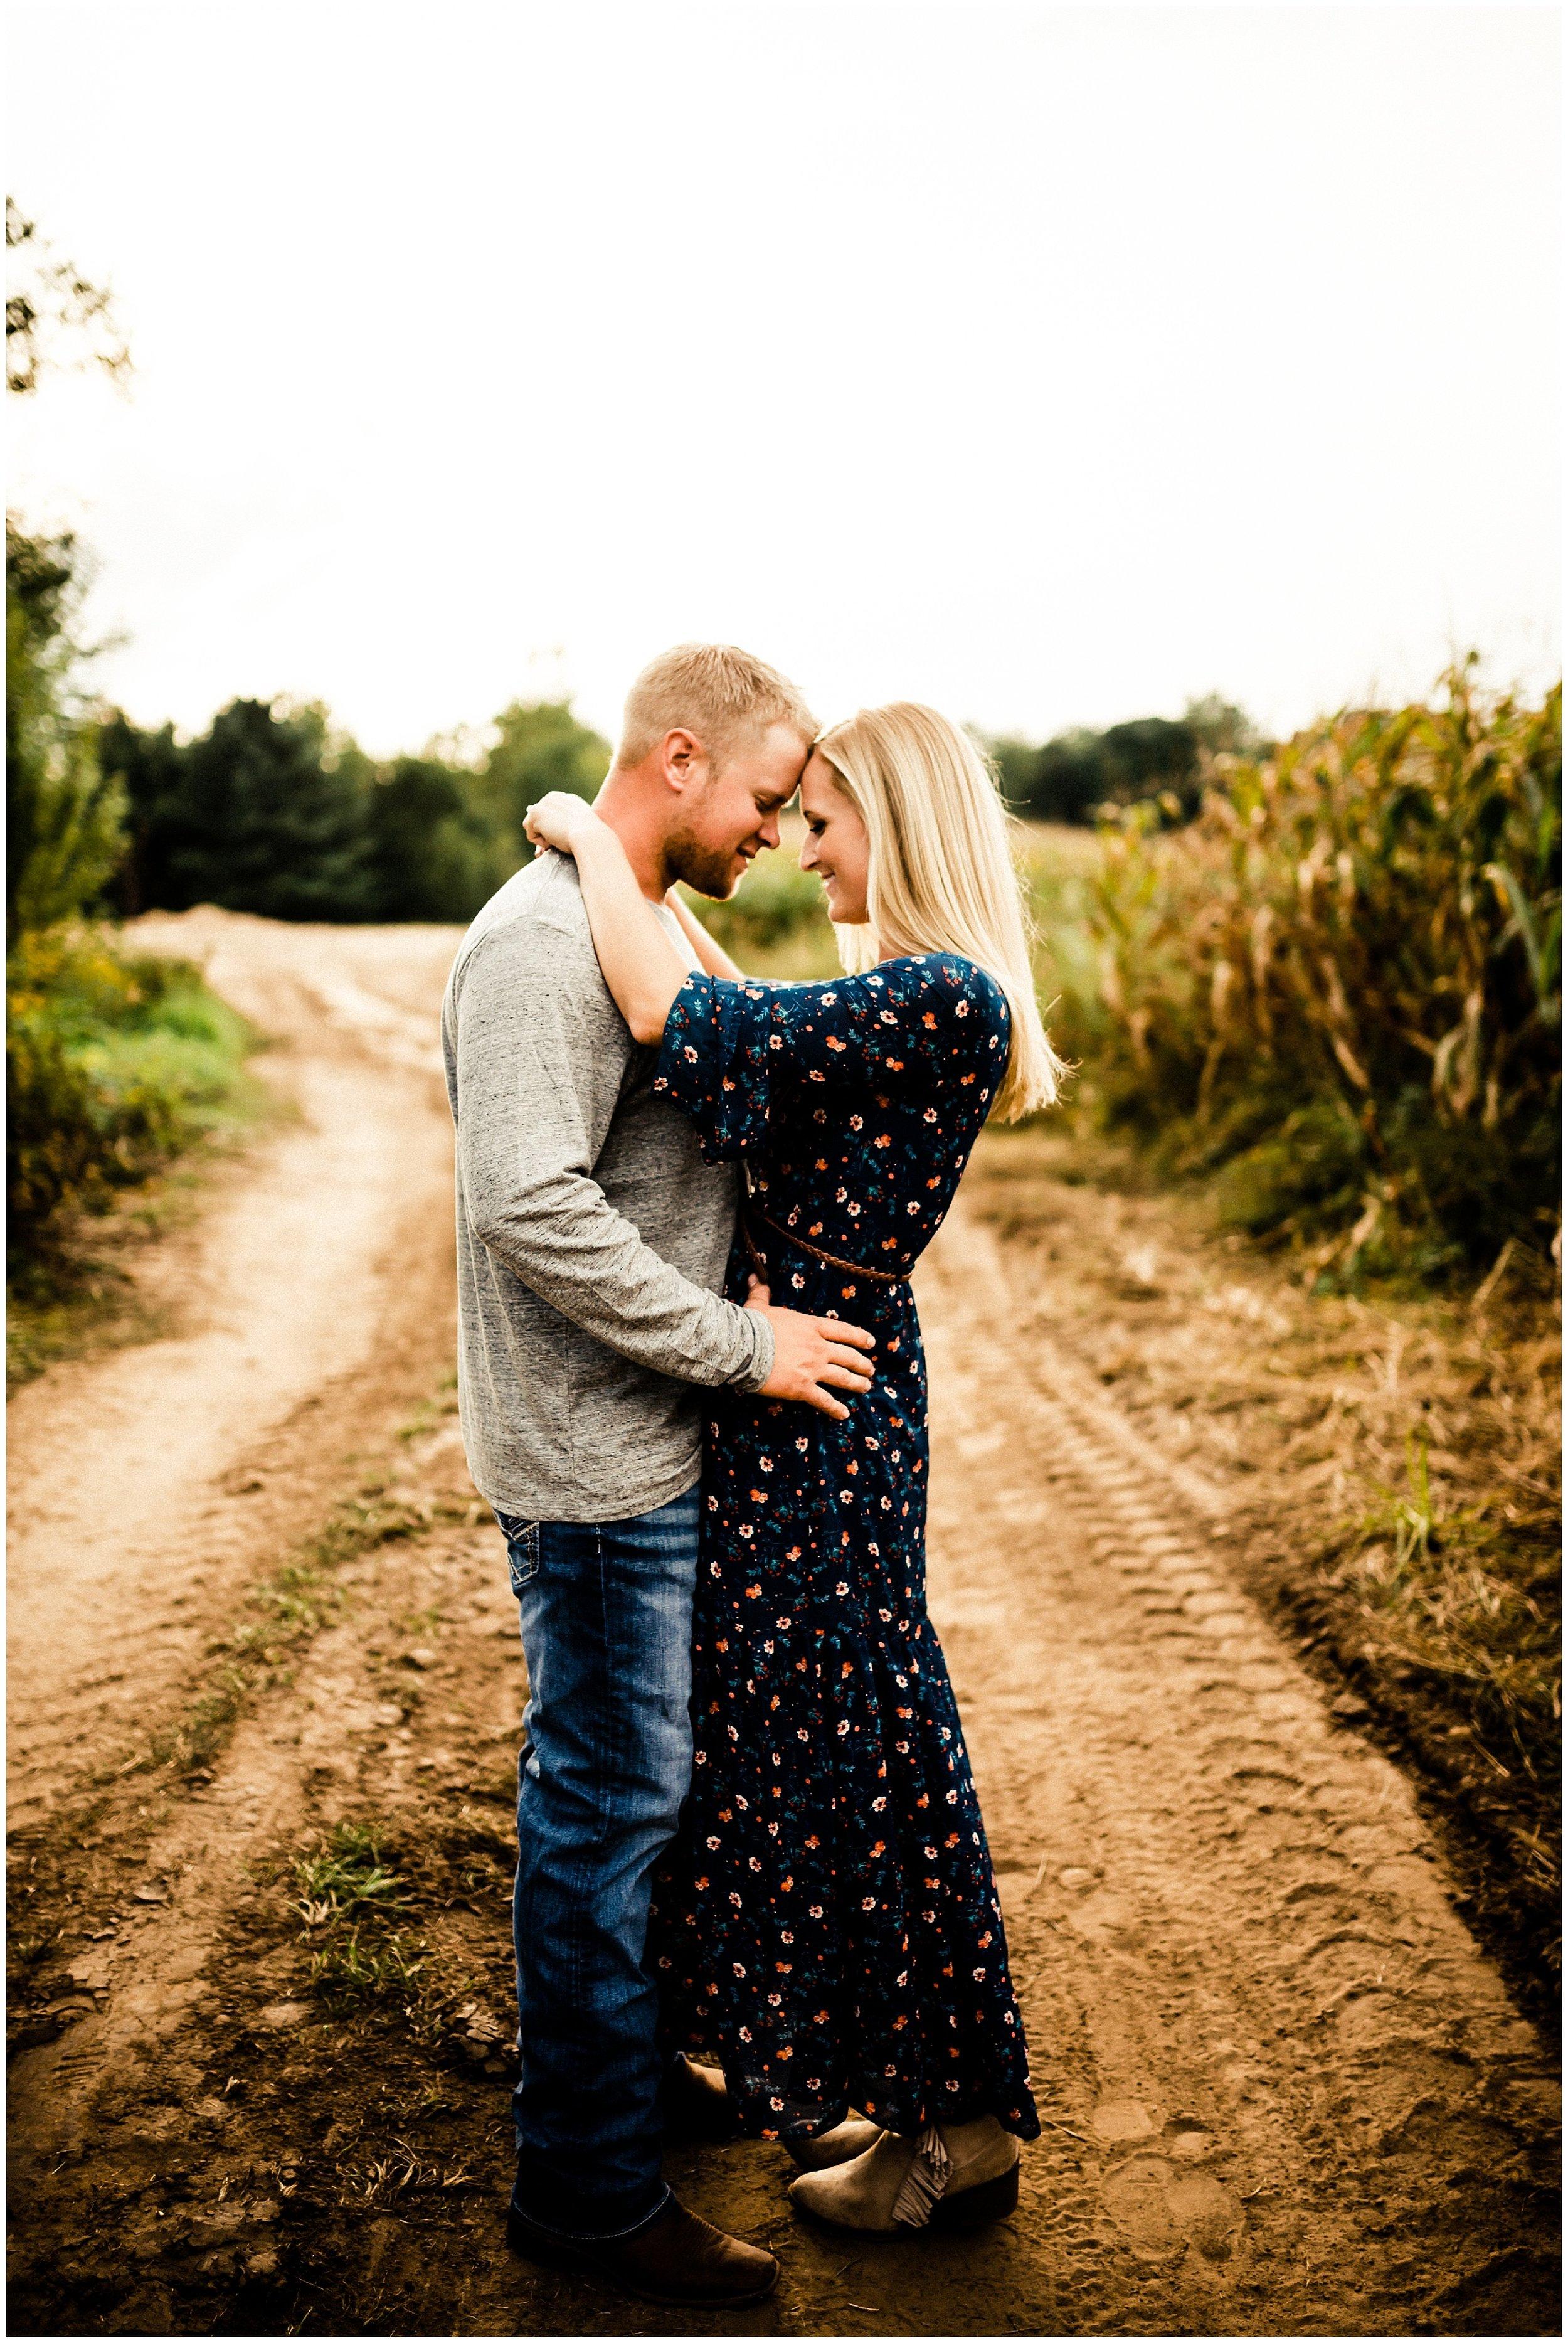 Ben + Haily | Engaged #kyleepaigephotography_1135.jpg